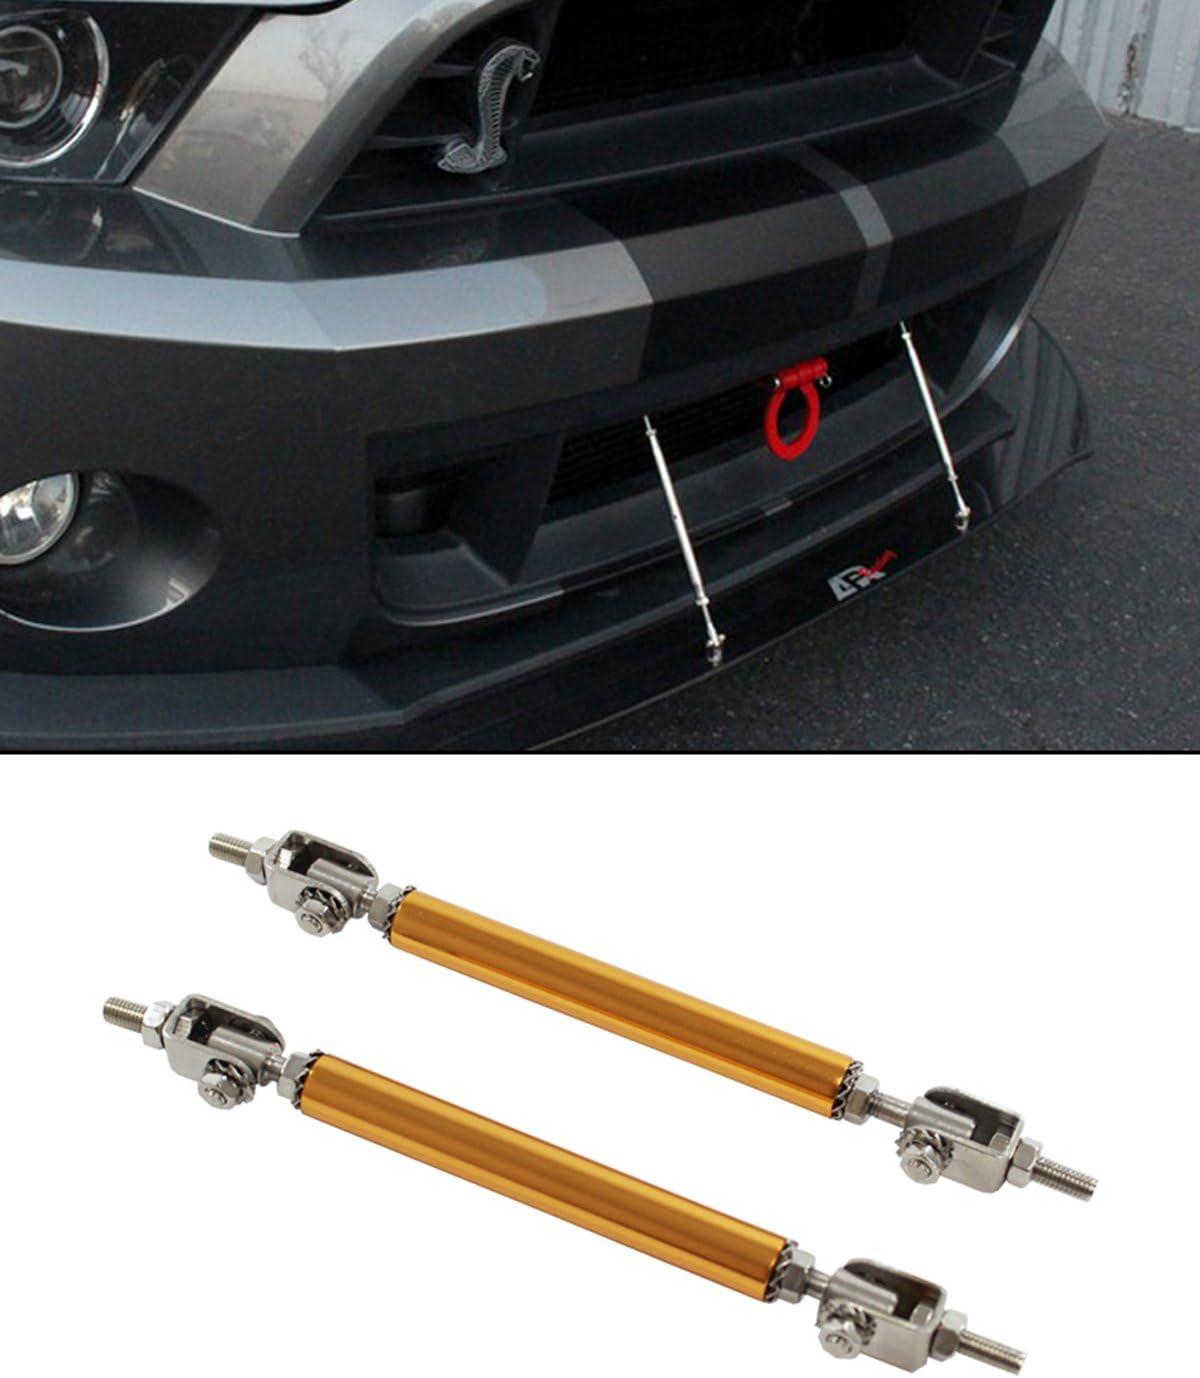 Red Front Rear Frame Bumper Protector Rod Splitter Strut Tie Bars 140mm-200mm